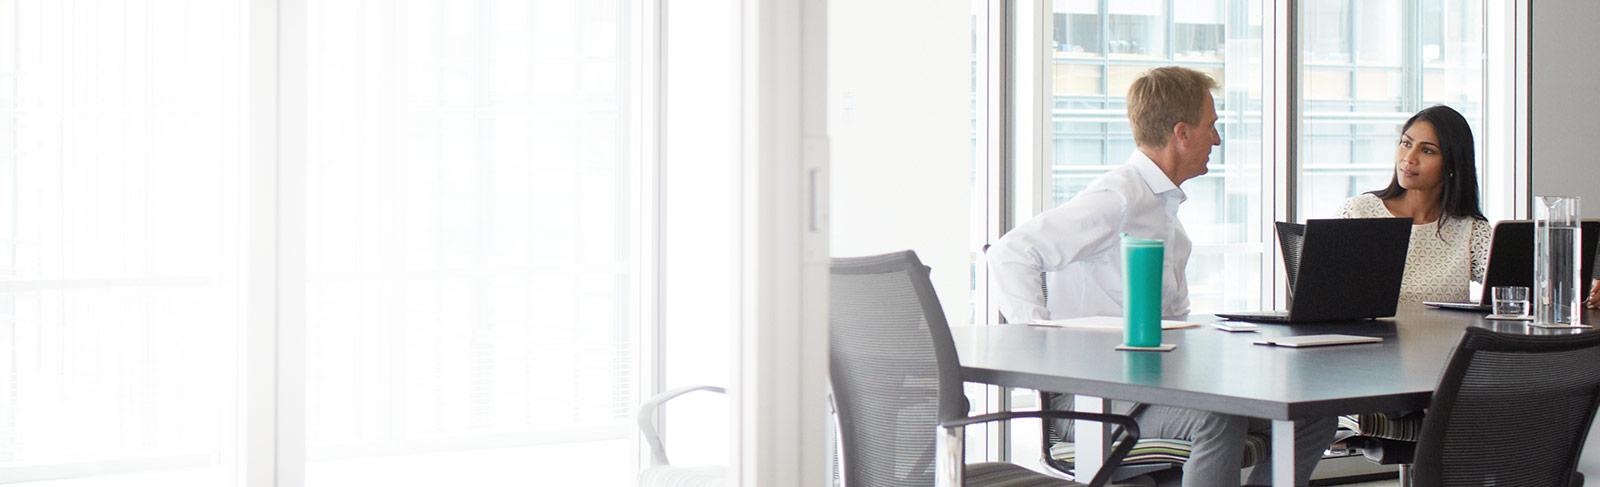 Dos trabajadores con portátiles en una sala de conferencias que usan Office 365 Enterprise E3.